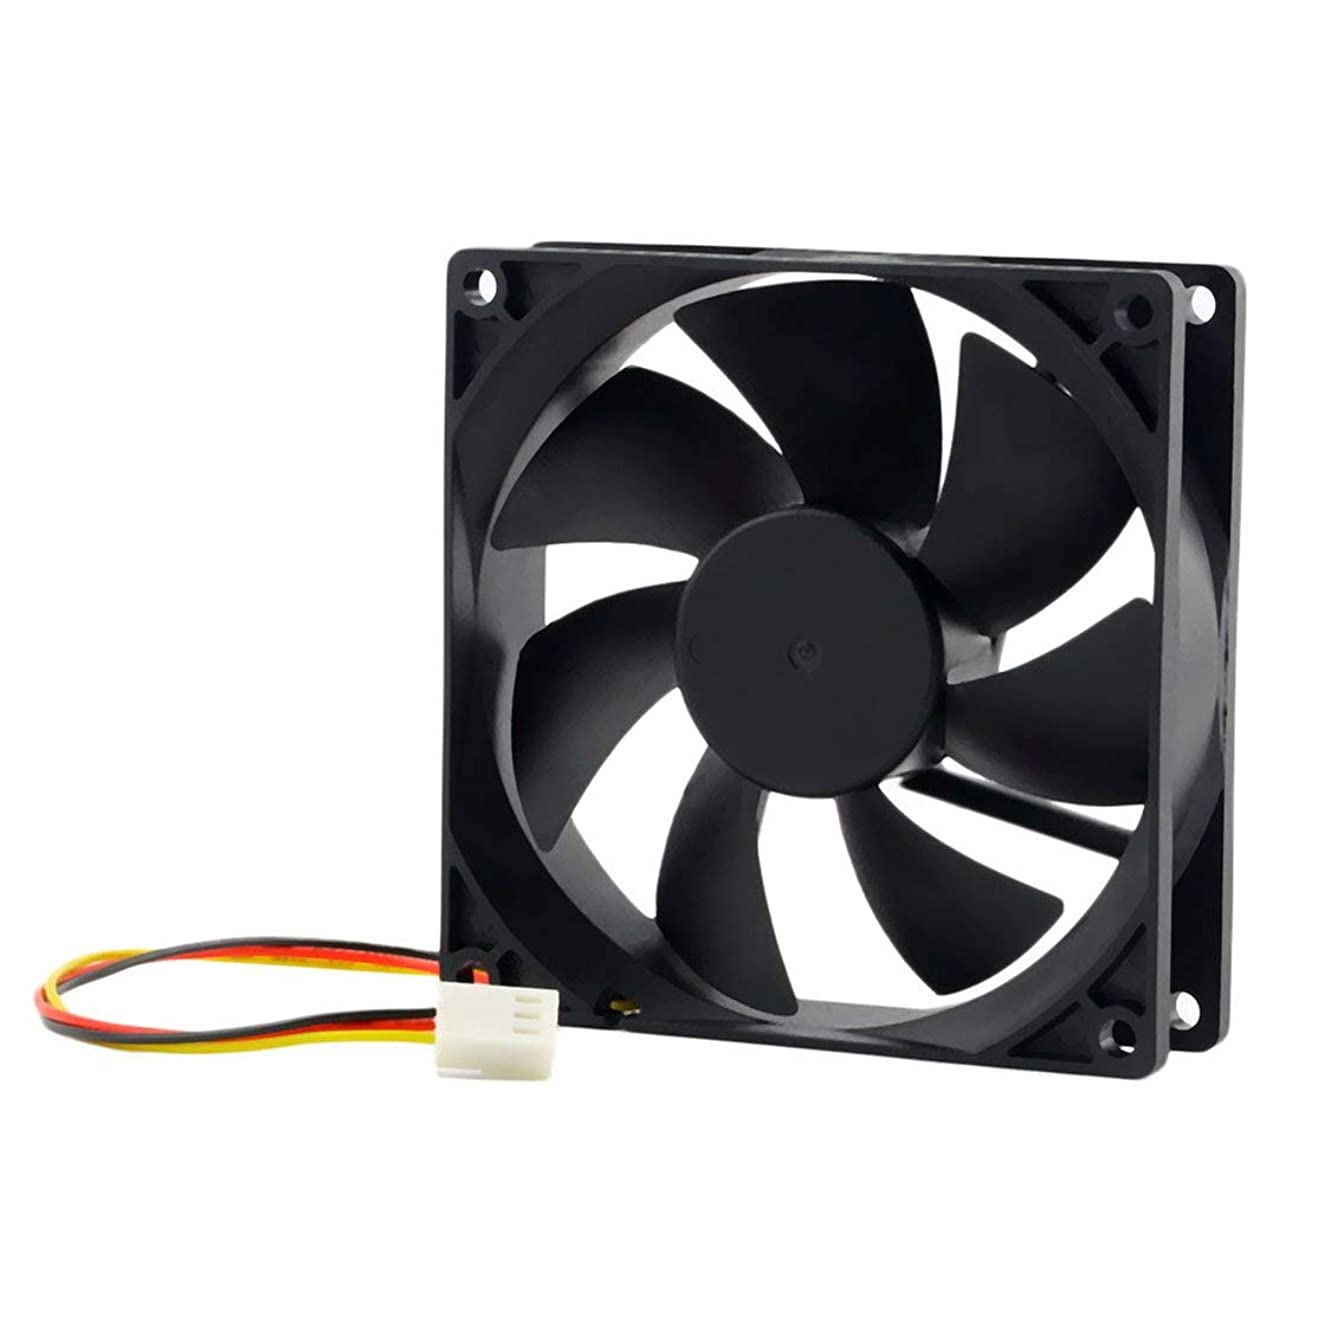 Exiao 1pc 12V 3-Pin 9cm 90 x 25mm 90mm CPU Heat Sinks Cooler Fan DC Cooling Fan 65 CFM Fast Free